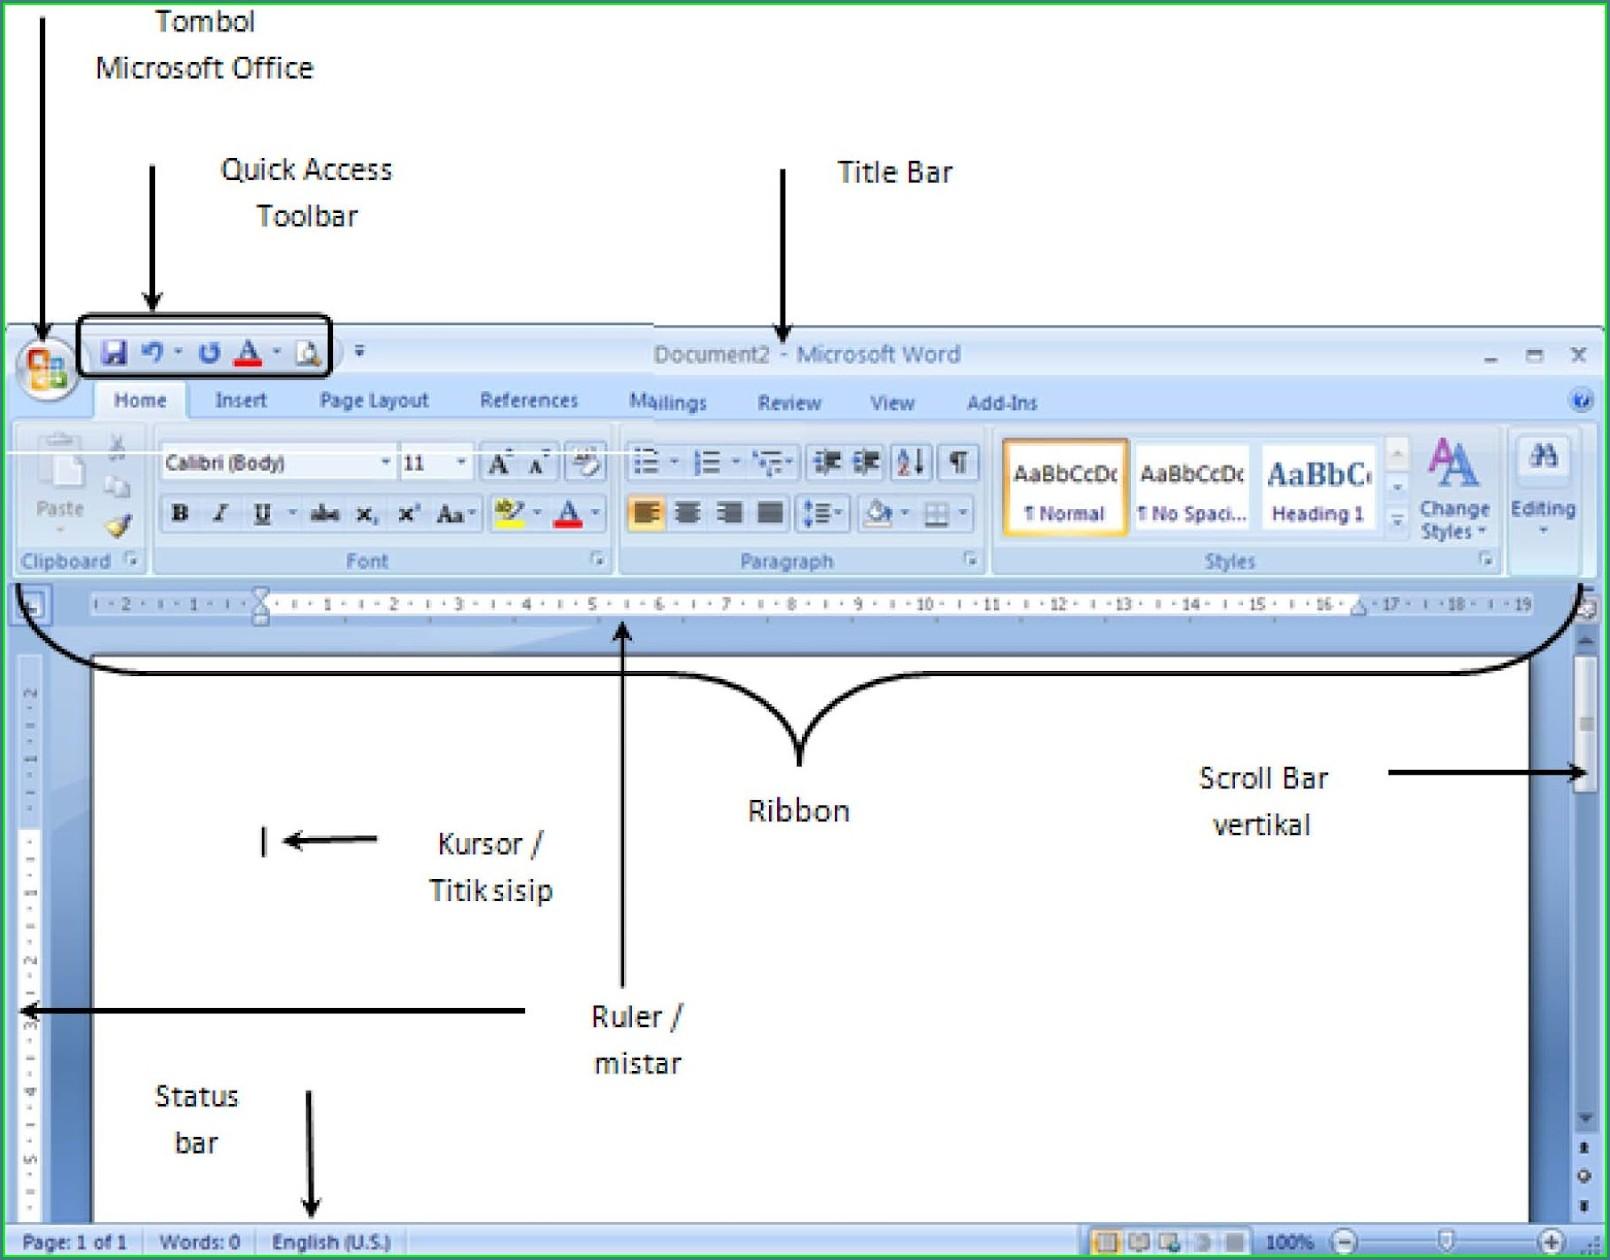 Microsoft Word 2010 Home Ribbon Worksheet